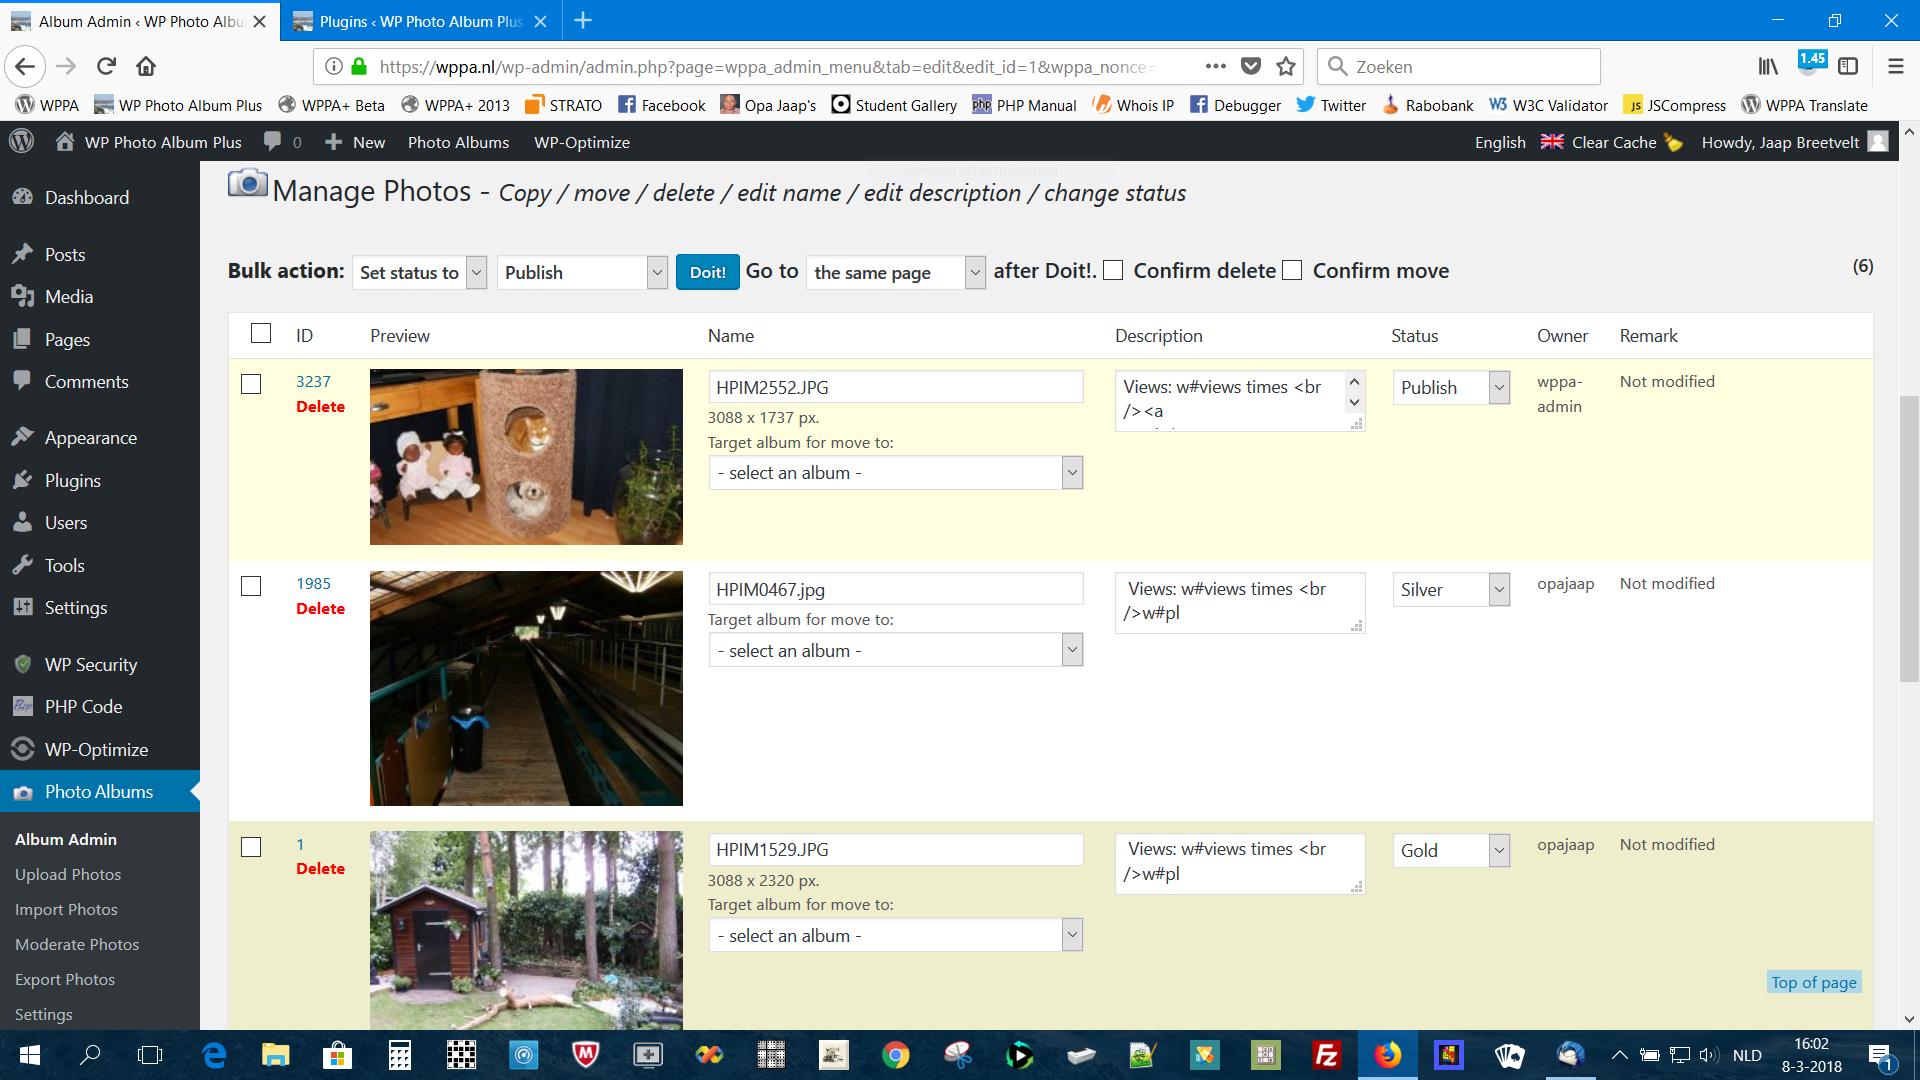 Bulk edit photo information screen